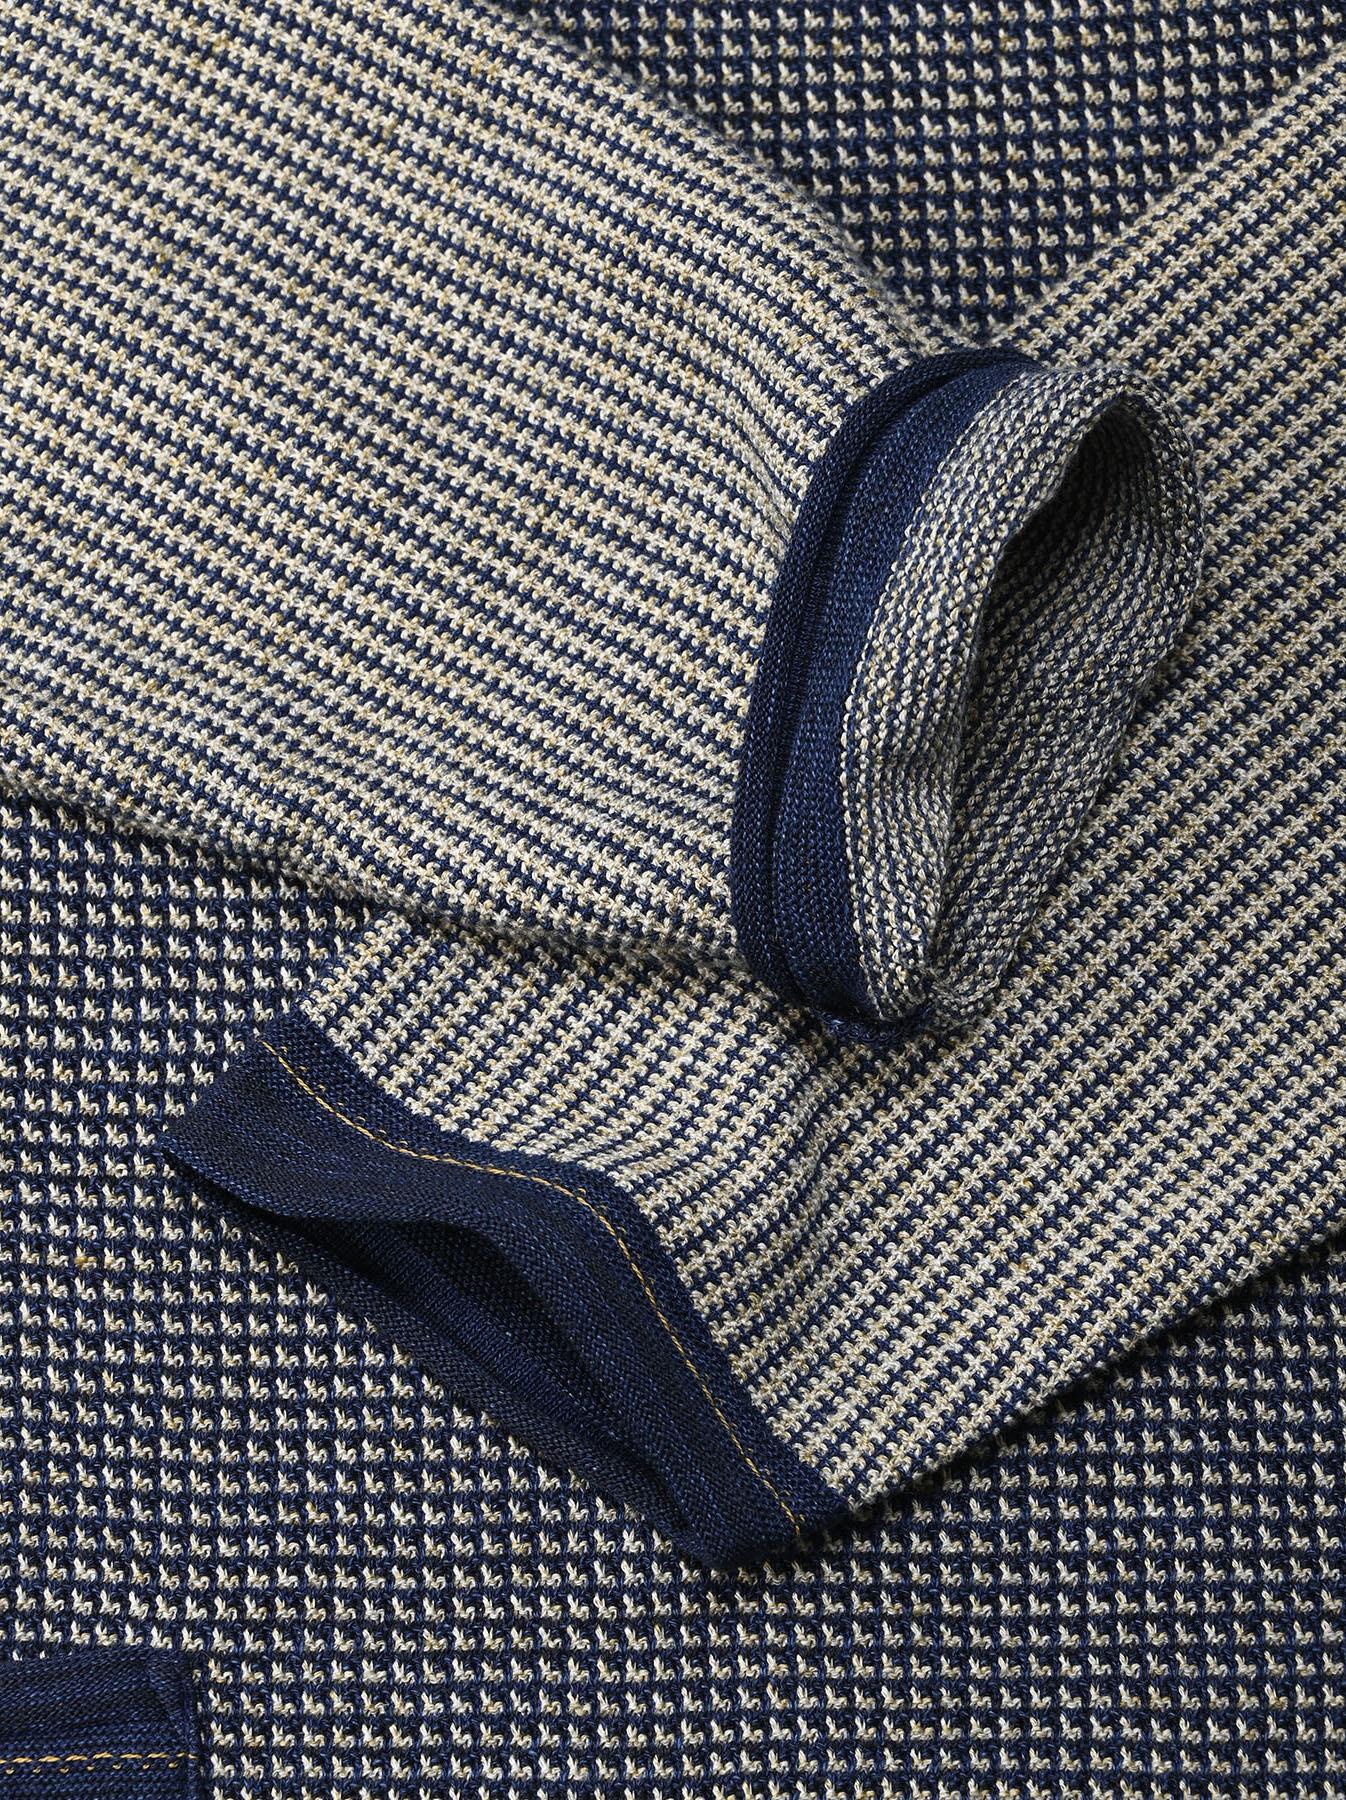 Indigo Tappet Kanoko Umahiko Sweater-10